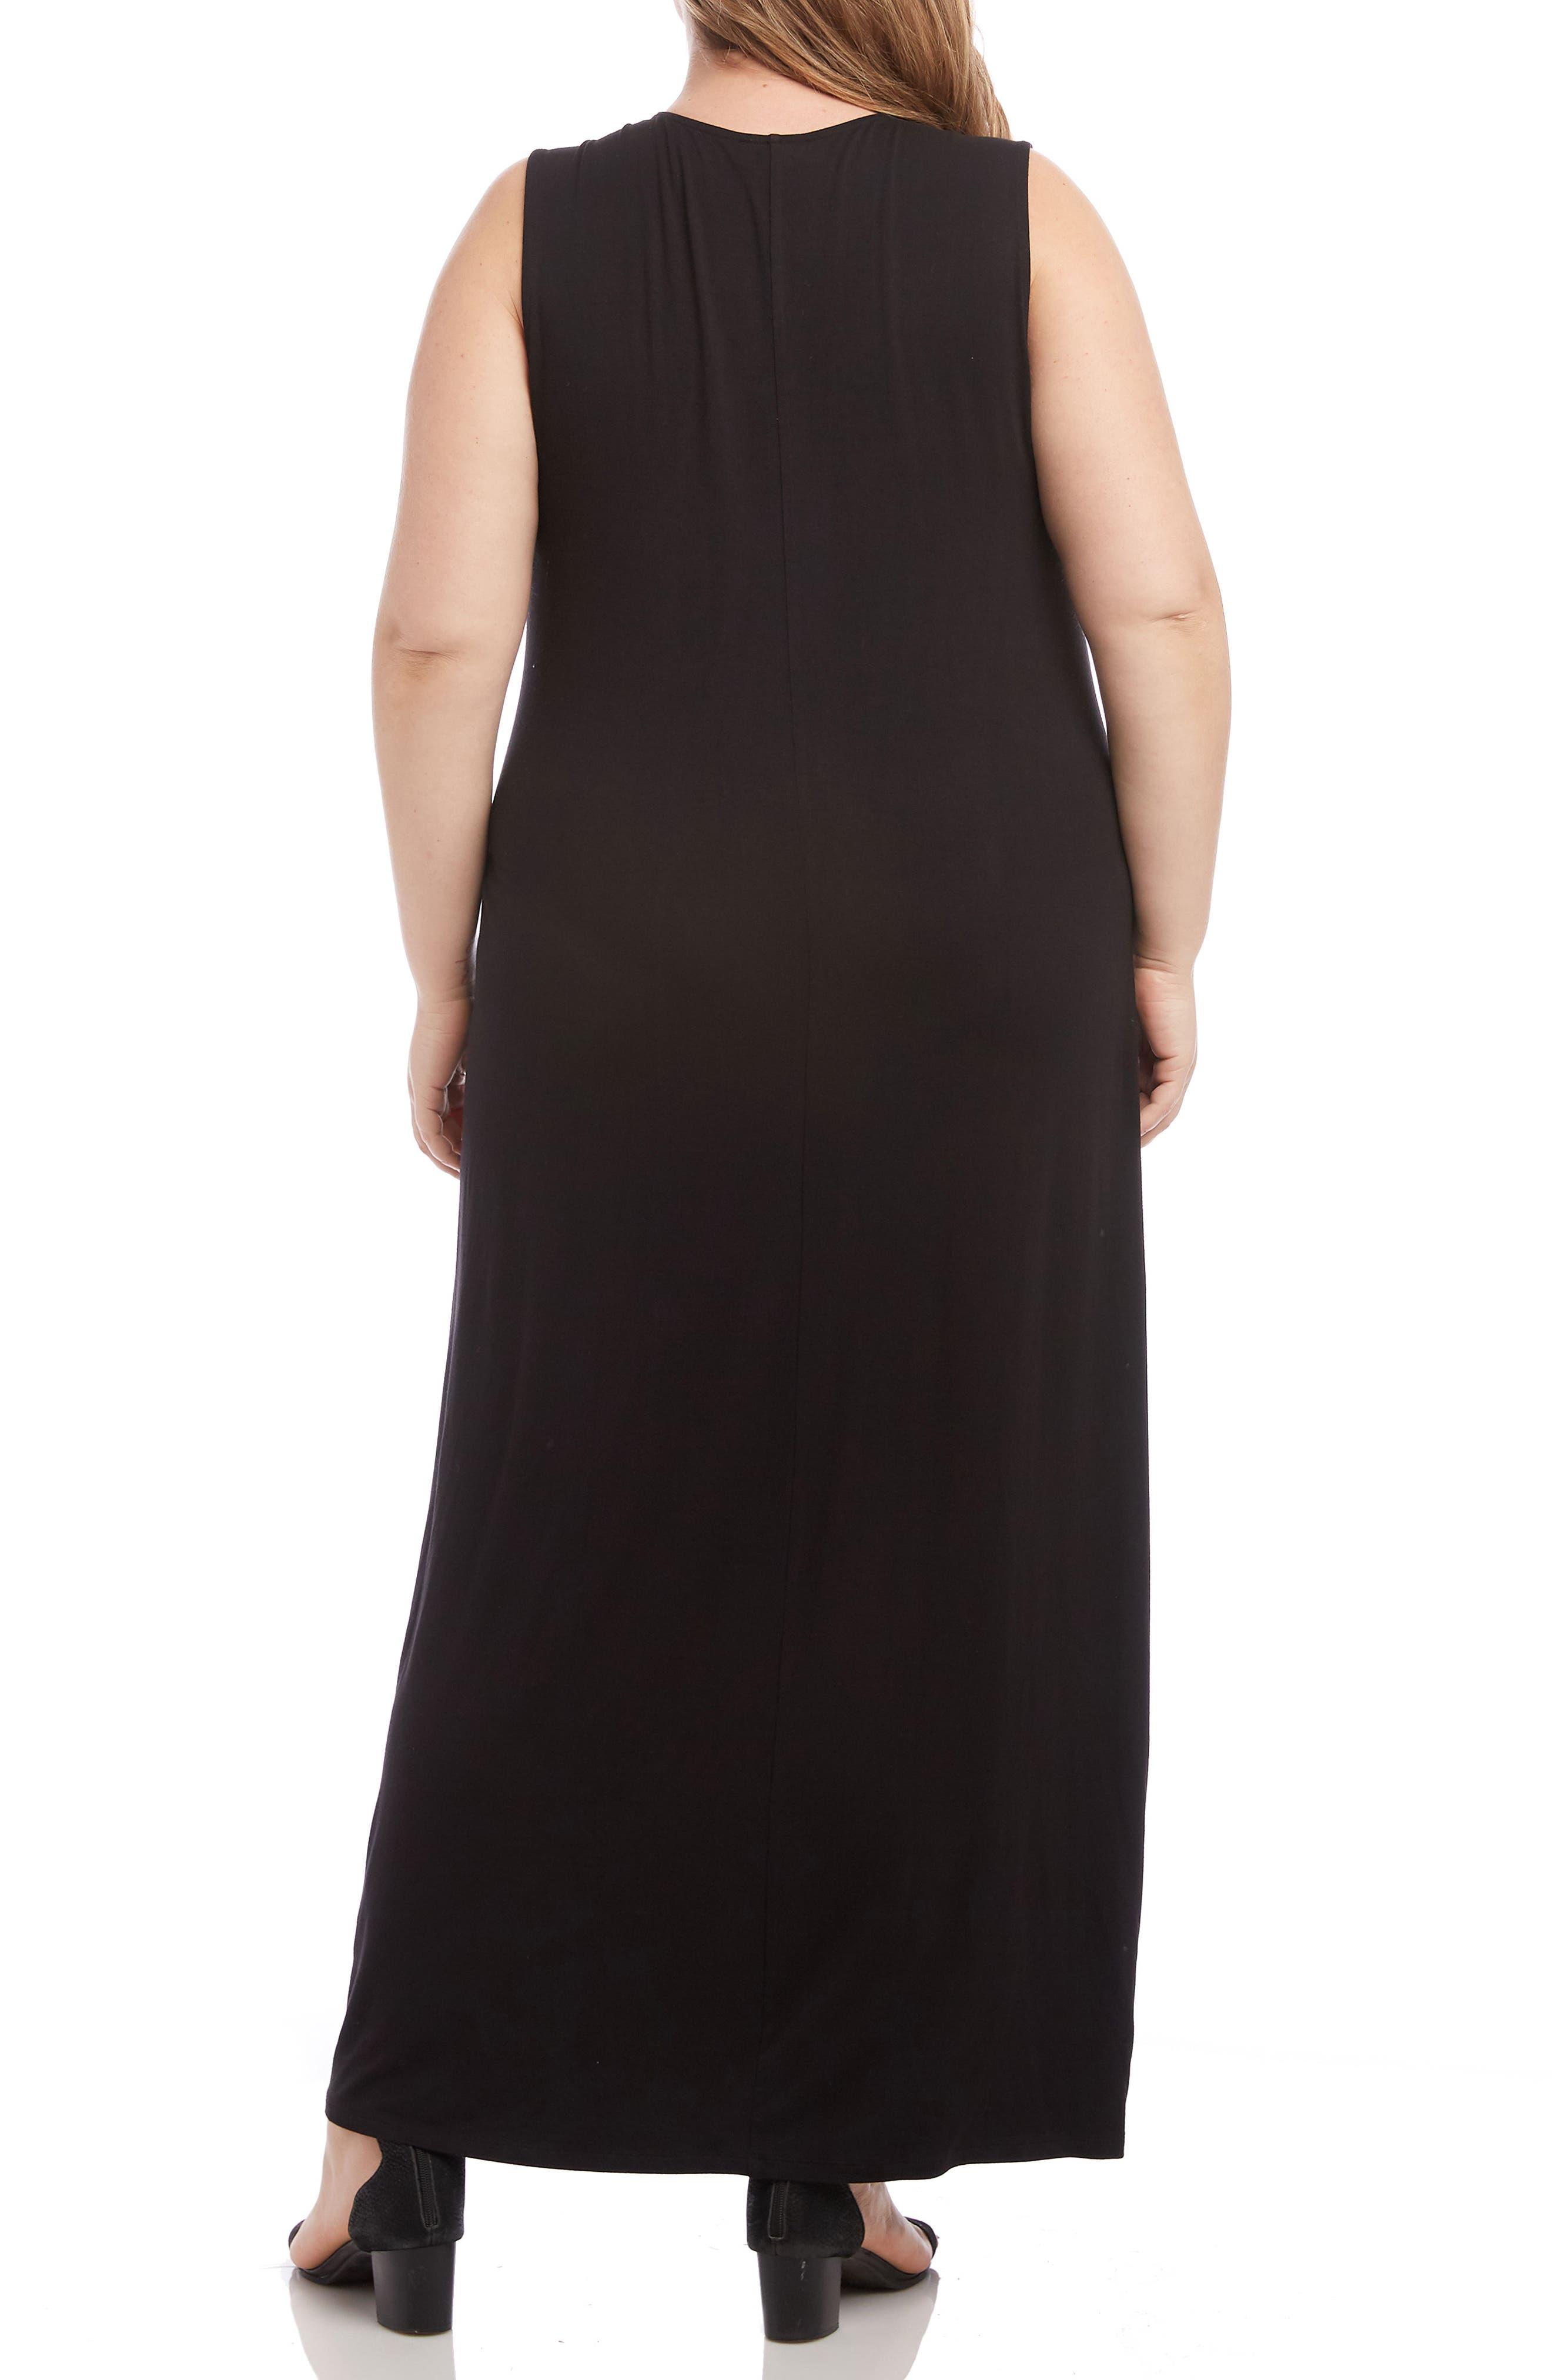 KAREN KANE, Embroidered Maxi Dress, Alternate thumbnail 2, color, BLACK